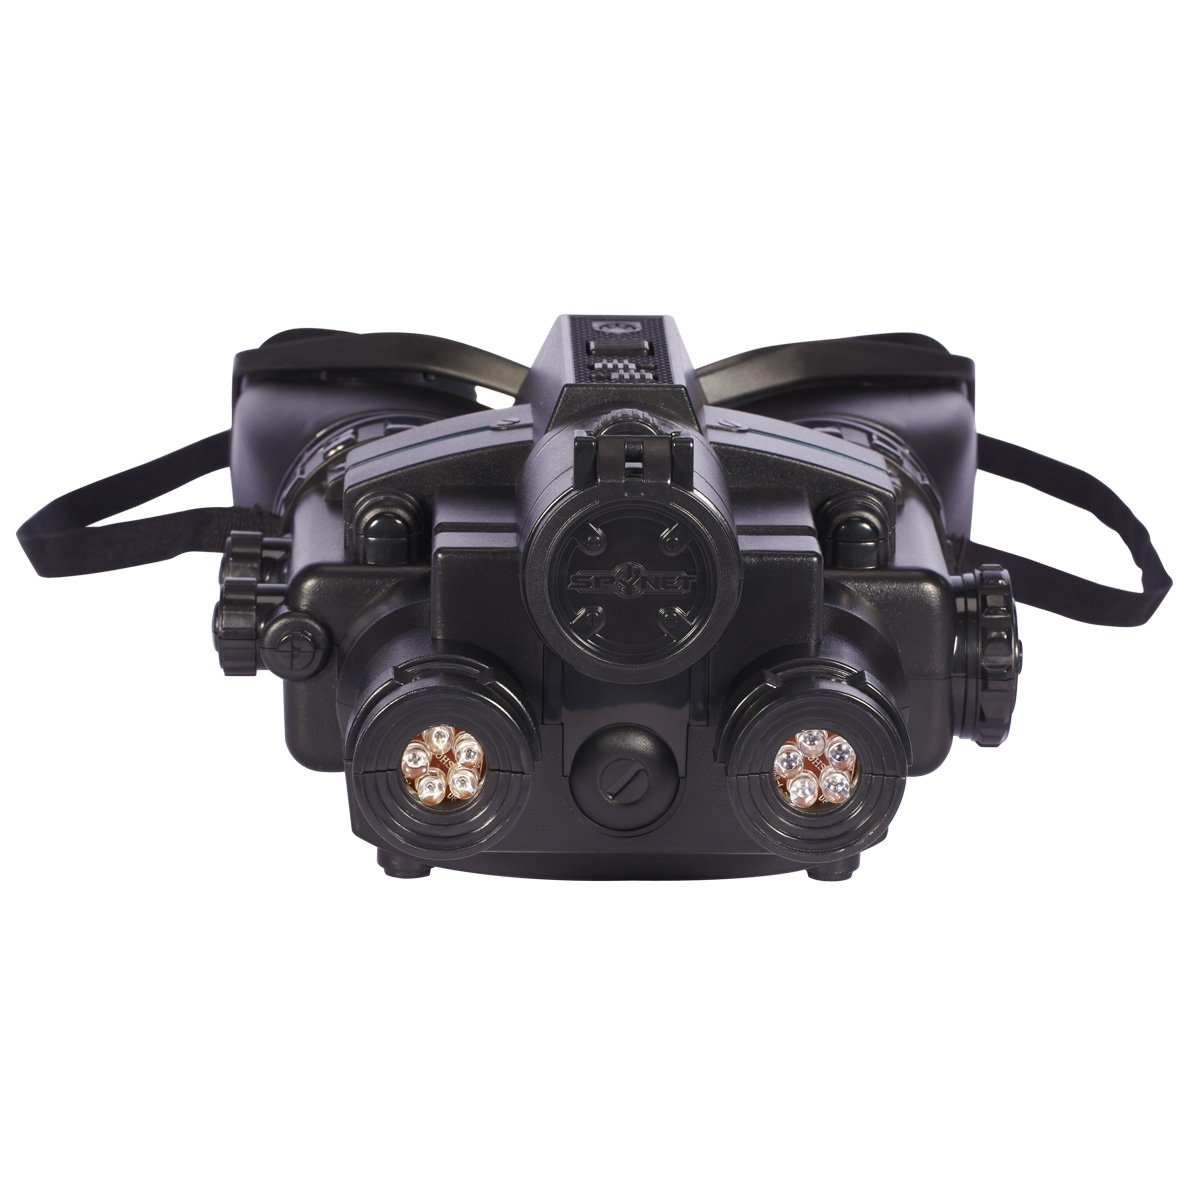 Spy Net Ultra Night Vision Goggles by SpyNet